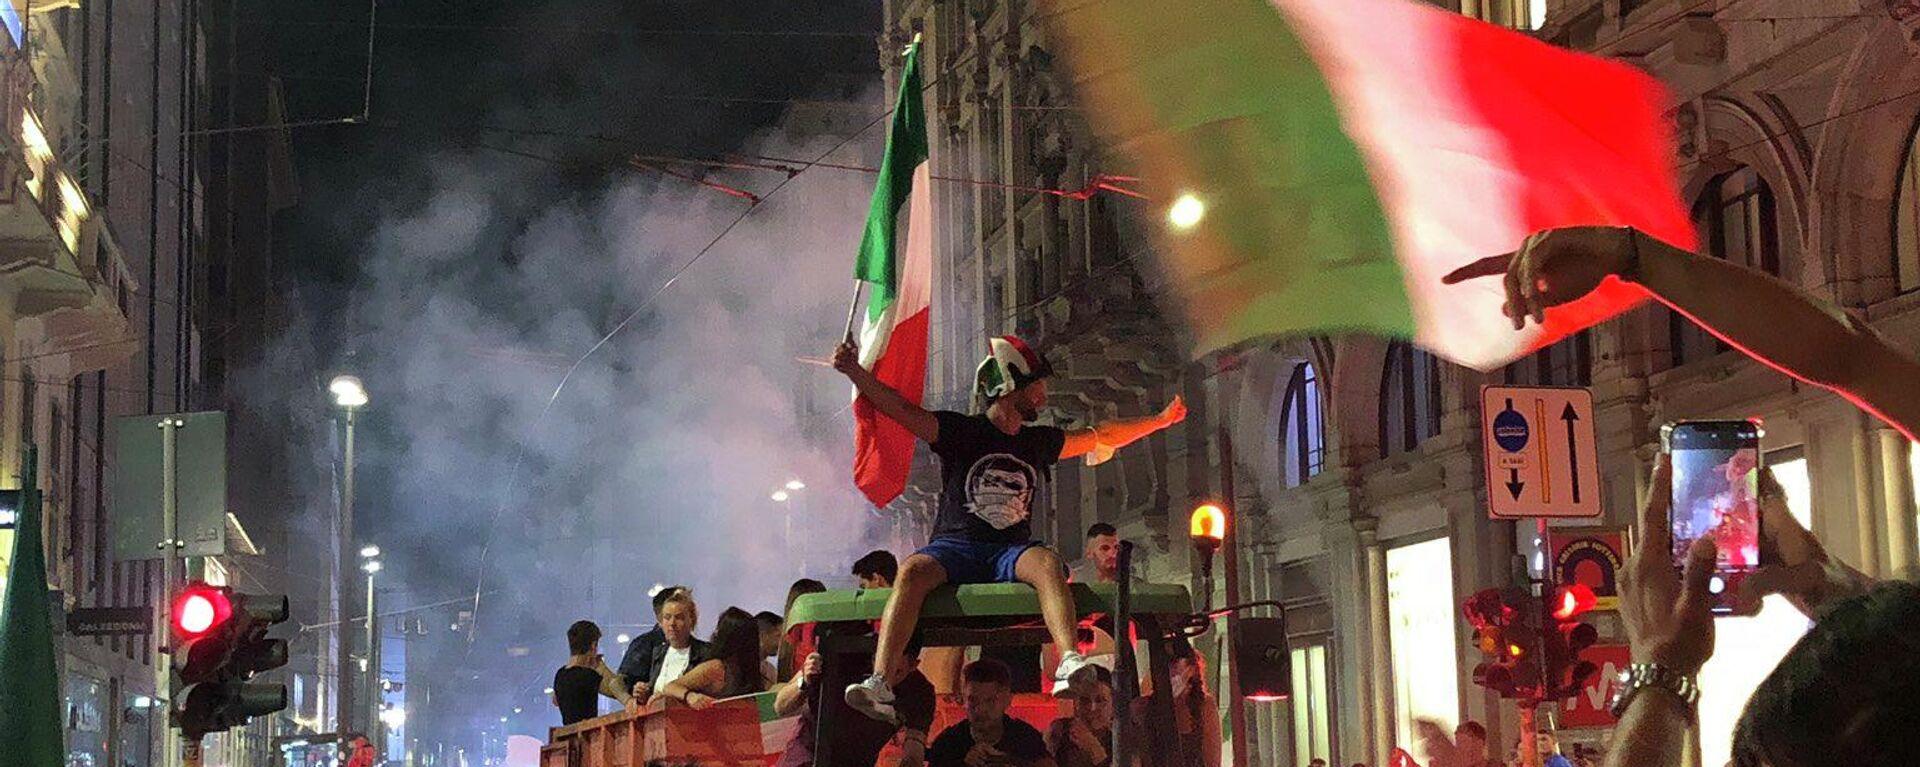 Festeggiamenti Italia - Sputnik Italia, 1920, 12.07.2021